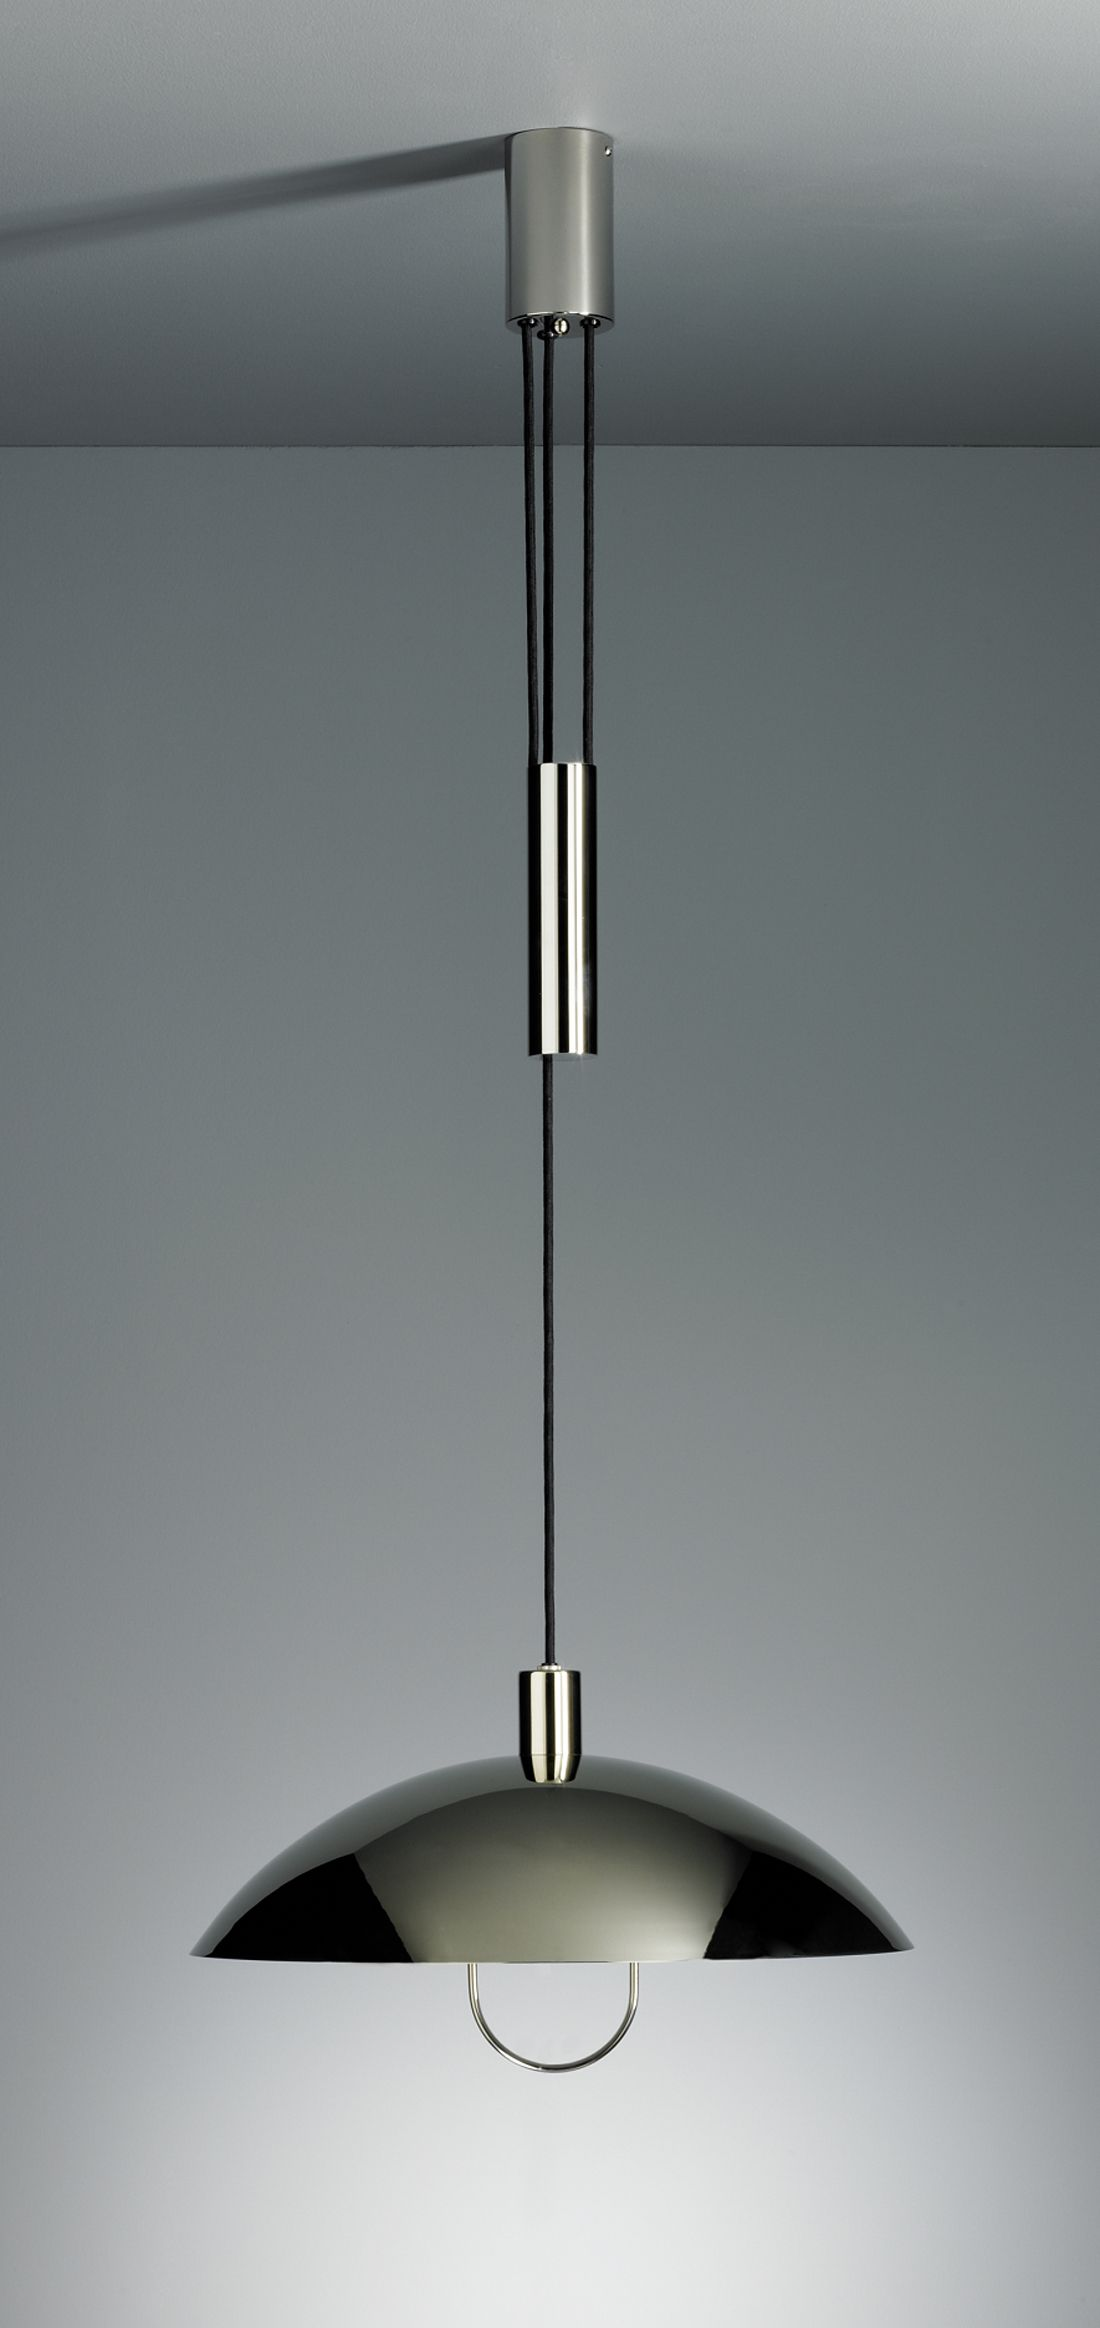 Bauhaus pendant lamp marianne brandt and hans przyrembel 1925 - Ceiling Light Marianne Brandt 1925 Pendulum Light